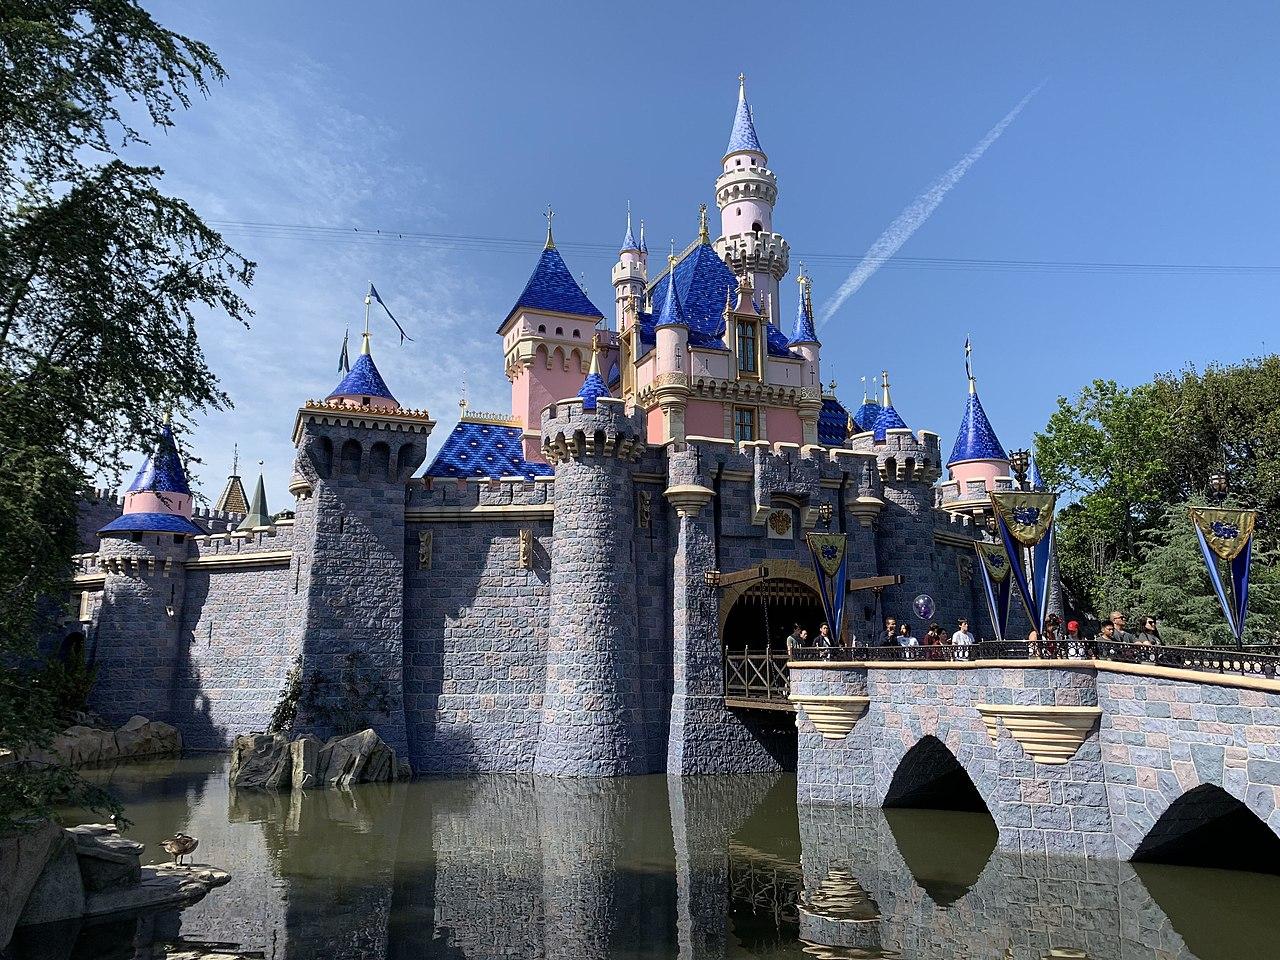 Nice Vacation City in California-Disneyland Park, Anaheim